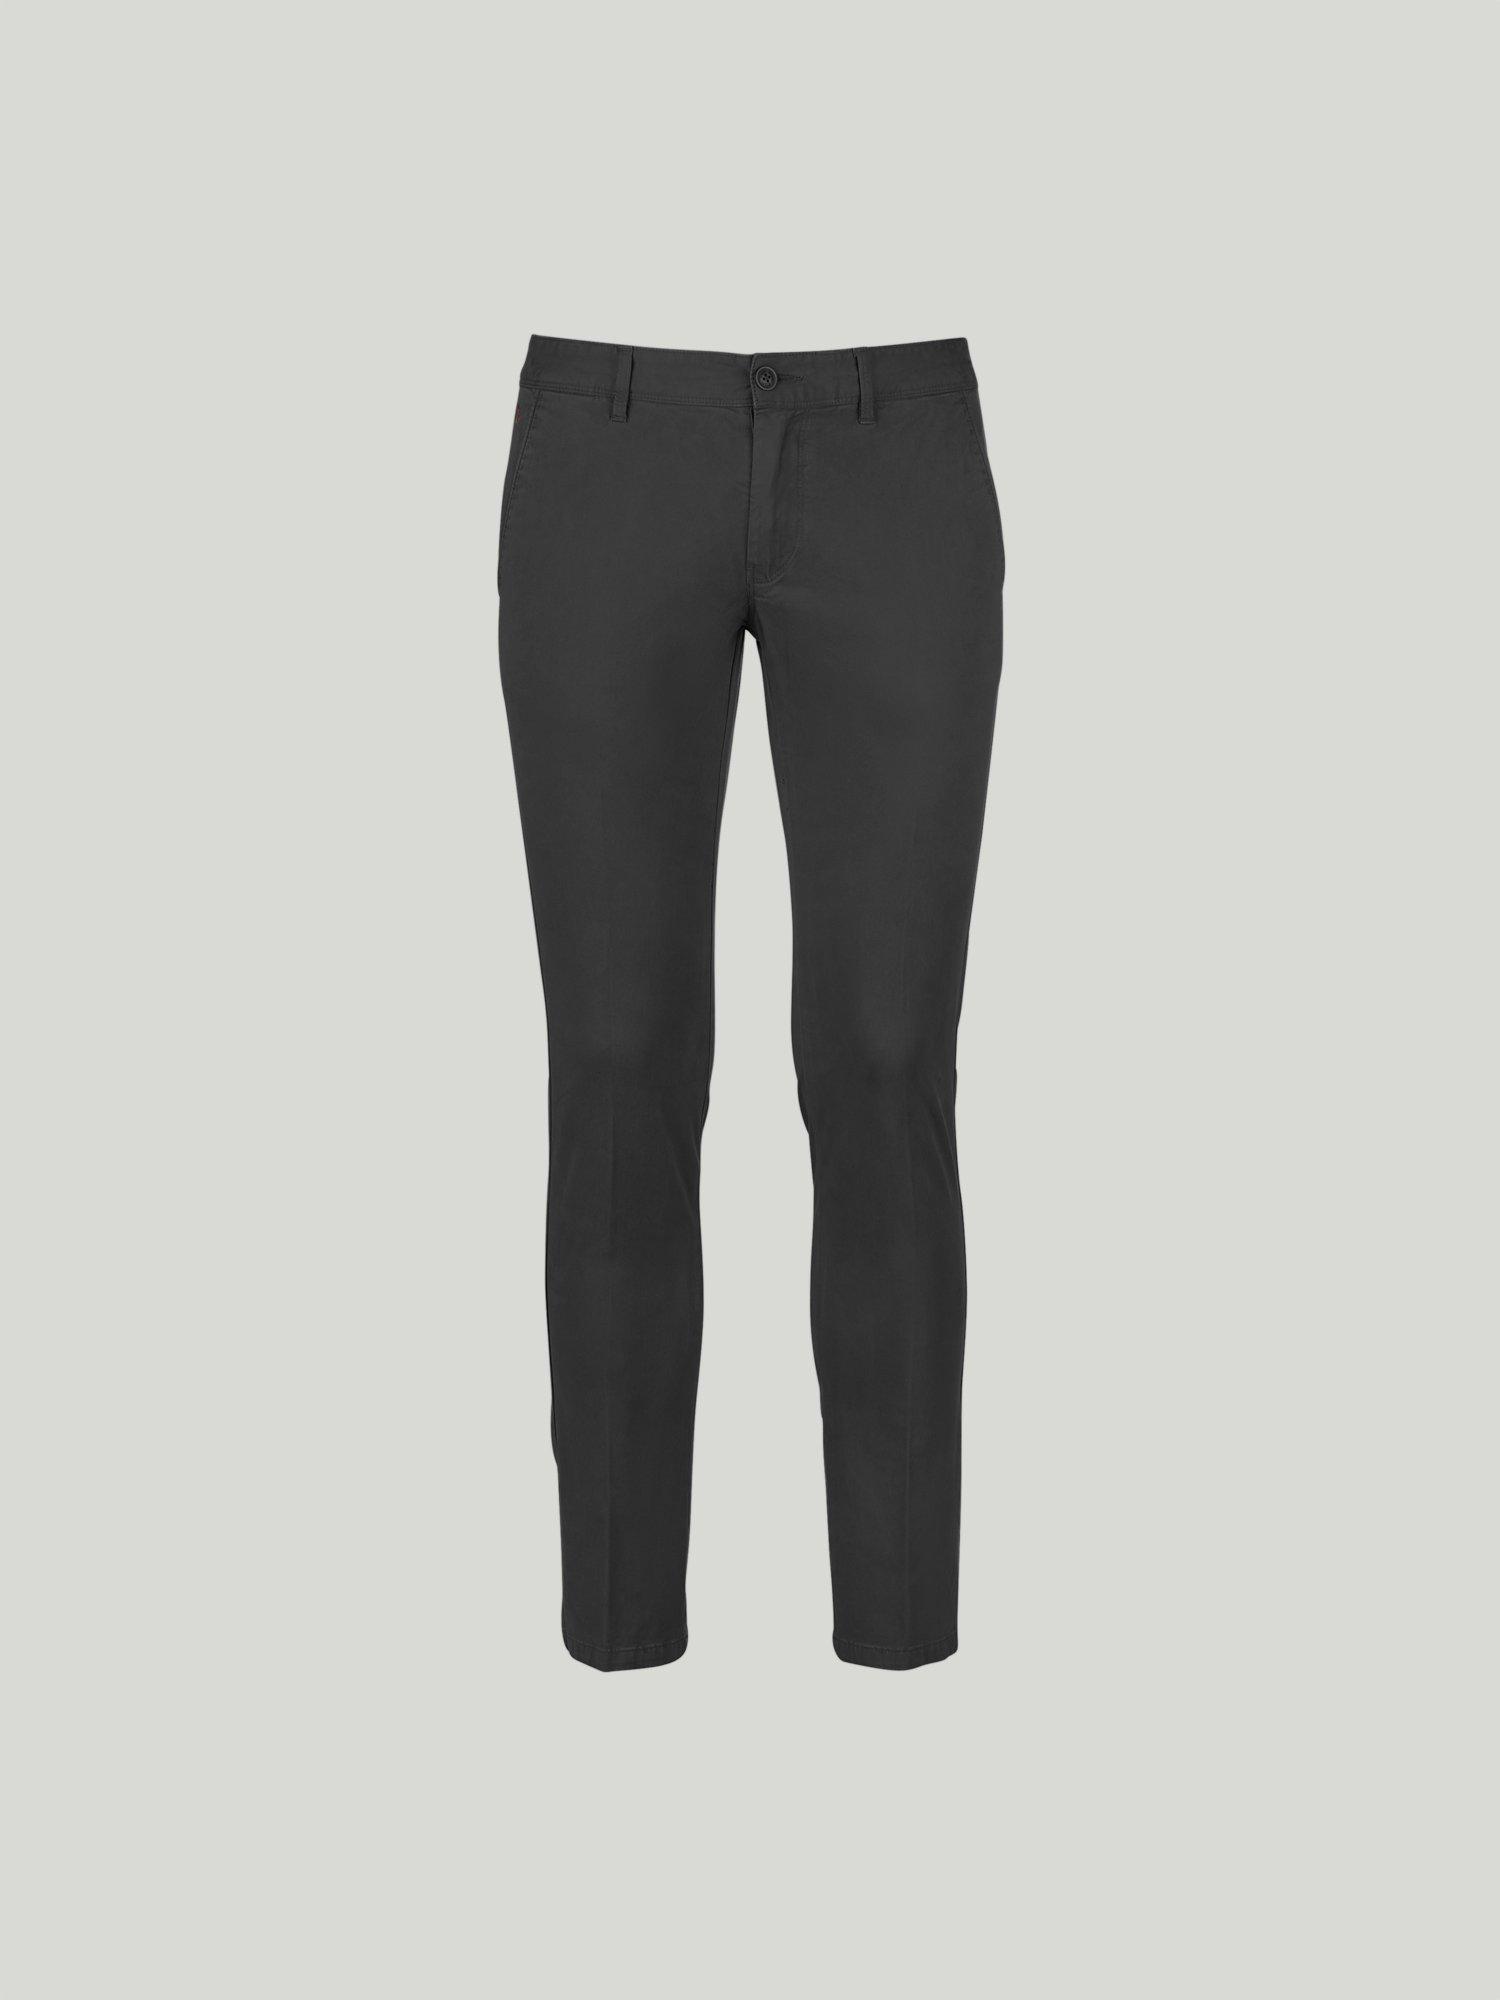 Pantalon B3 - Anthracite